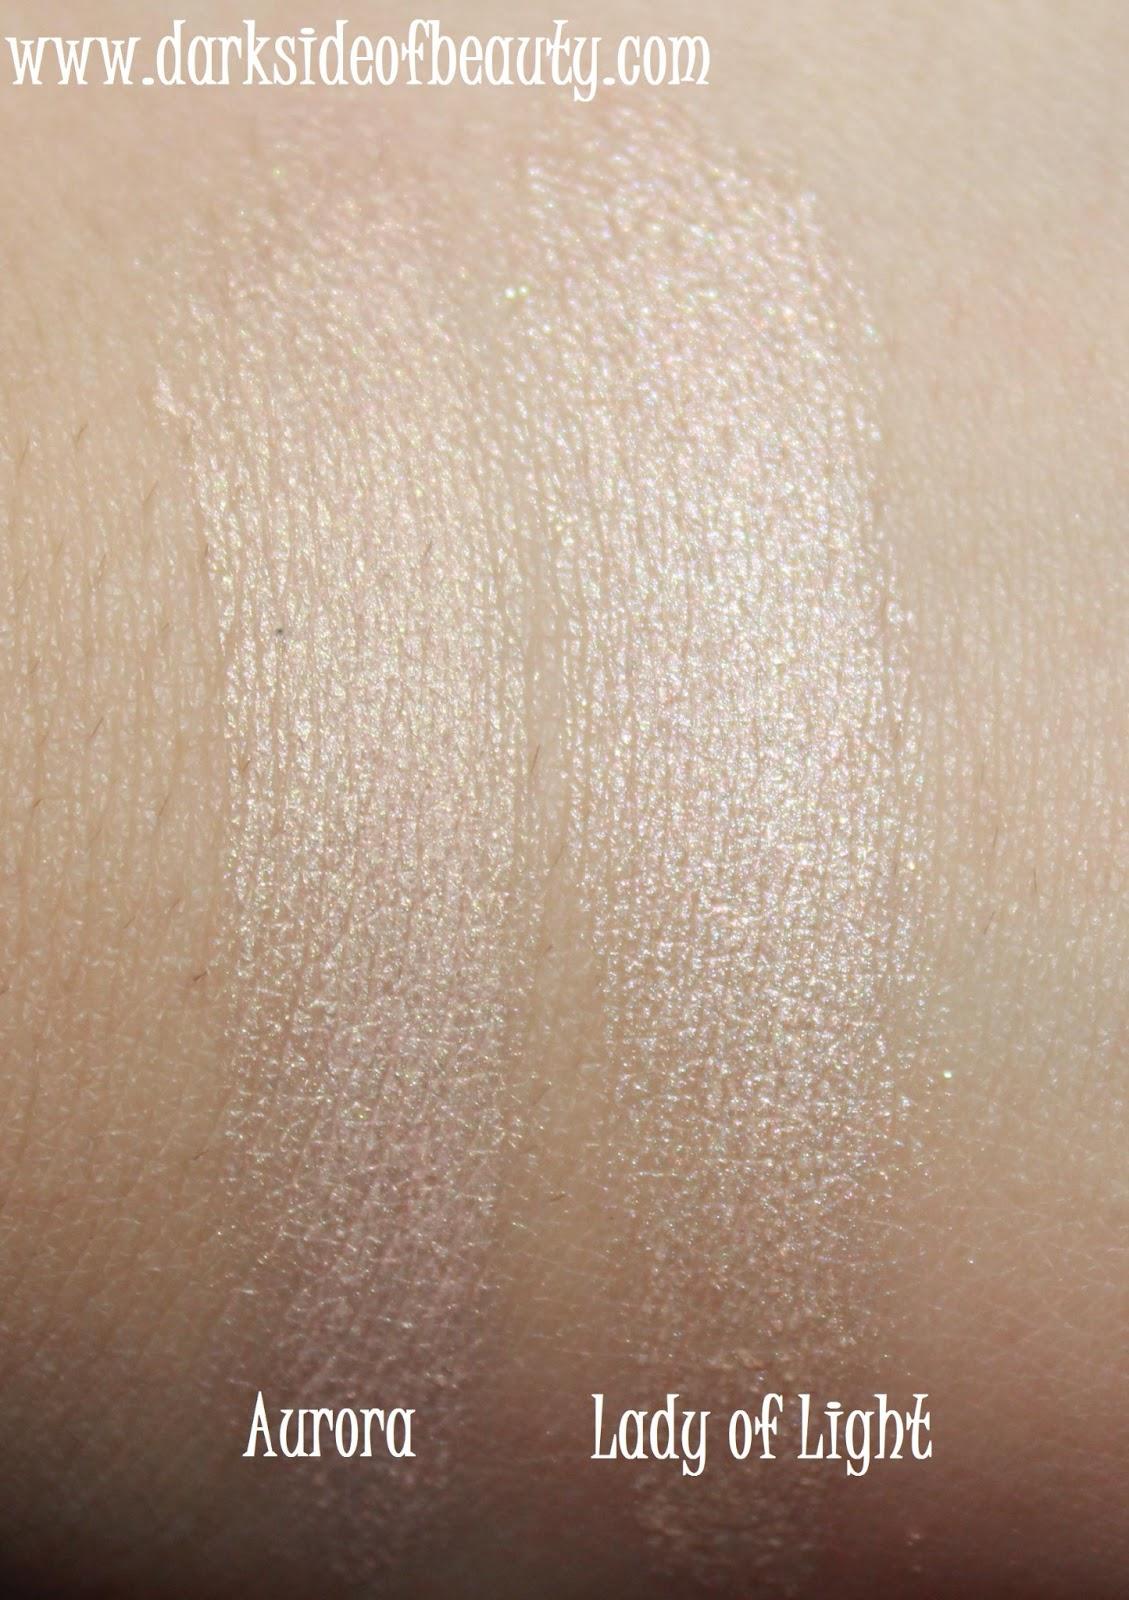 Gleam Reviews Photos: The Dark Side Of Beauty: Review: Illamasqua 'Aurora' Gleam